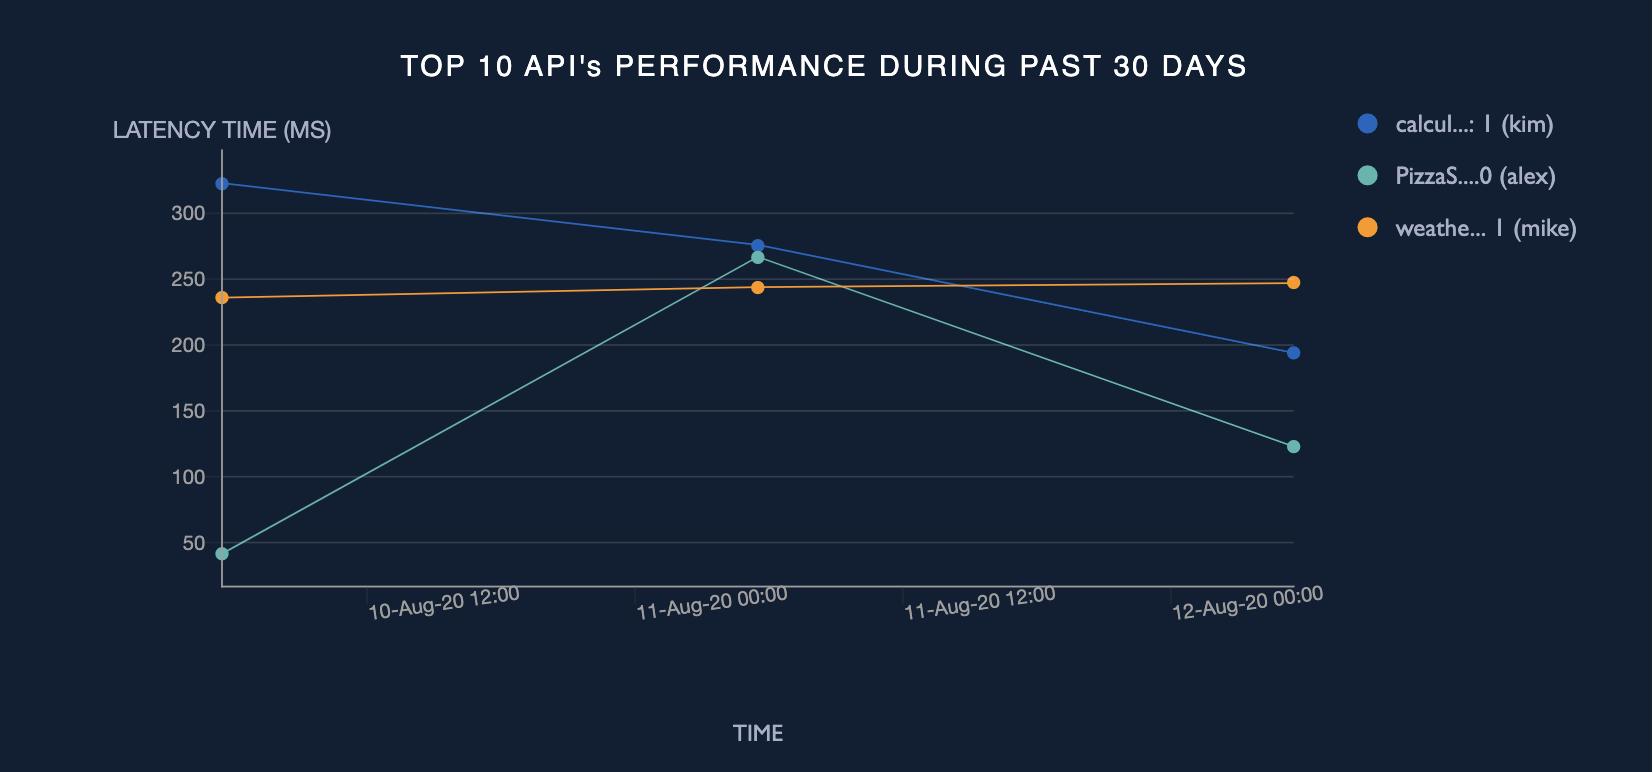 Top 10 API's performance summary